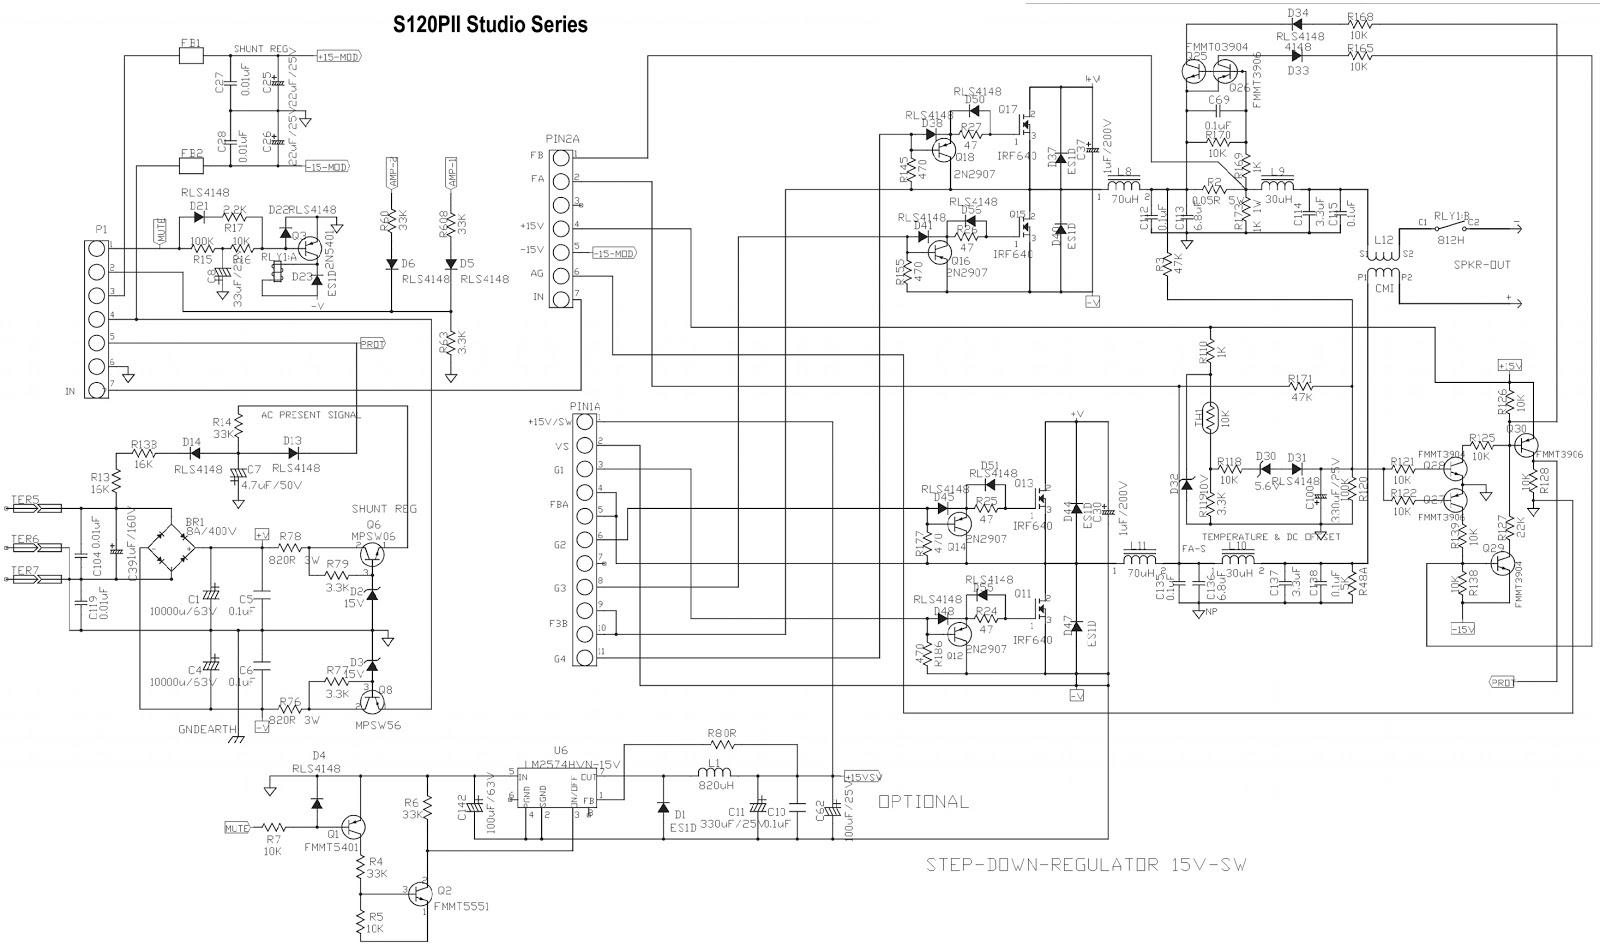 medium resolution of jbl s120pii powered subwoofer schematic